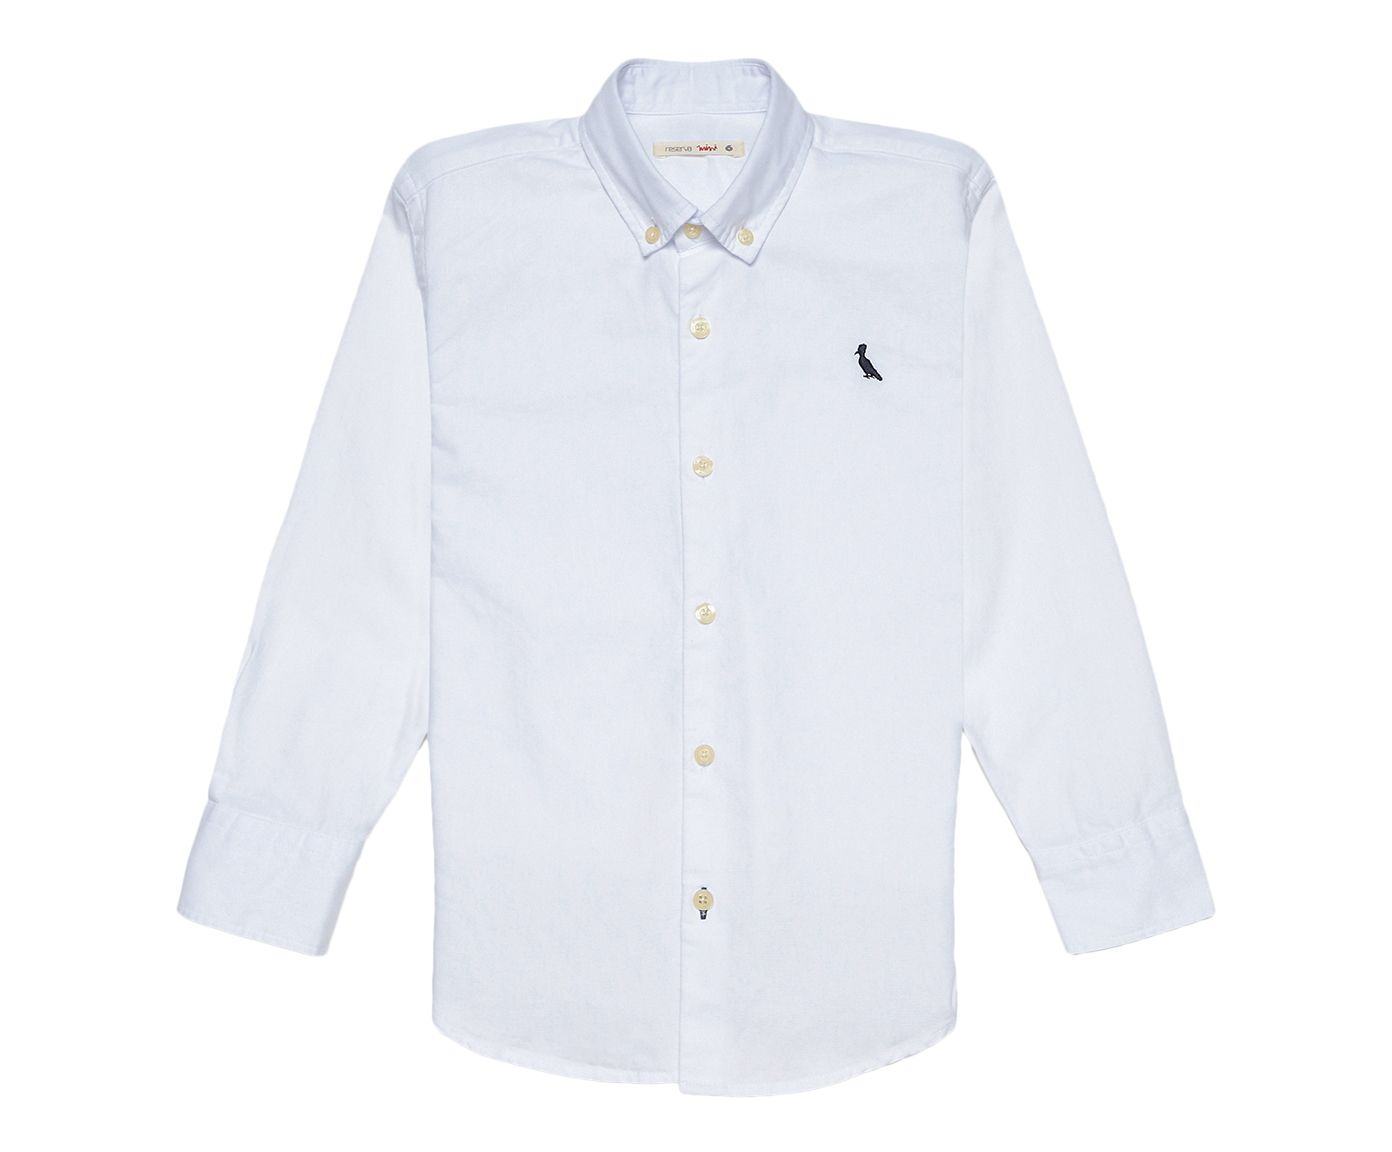 Camisa Infantil Reserva Mini Oxford Branca, 4 | Westwing.com.br